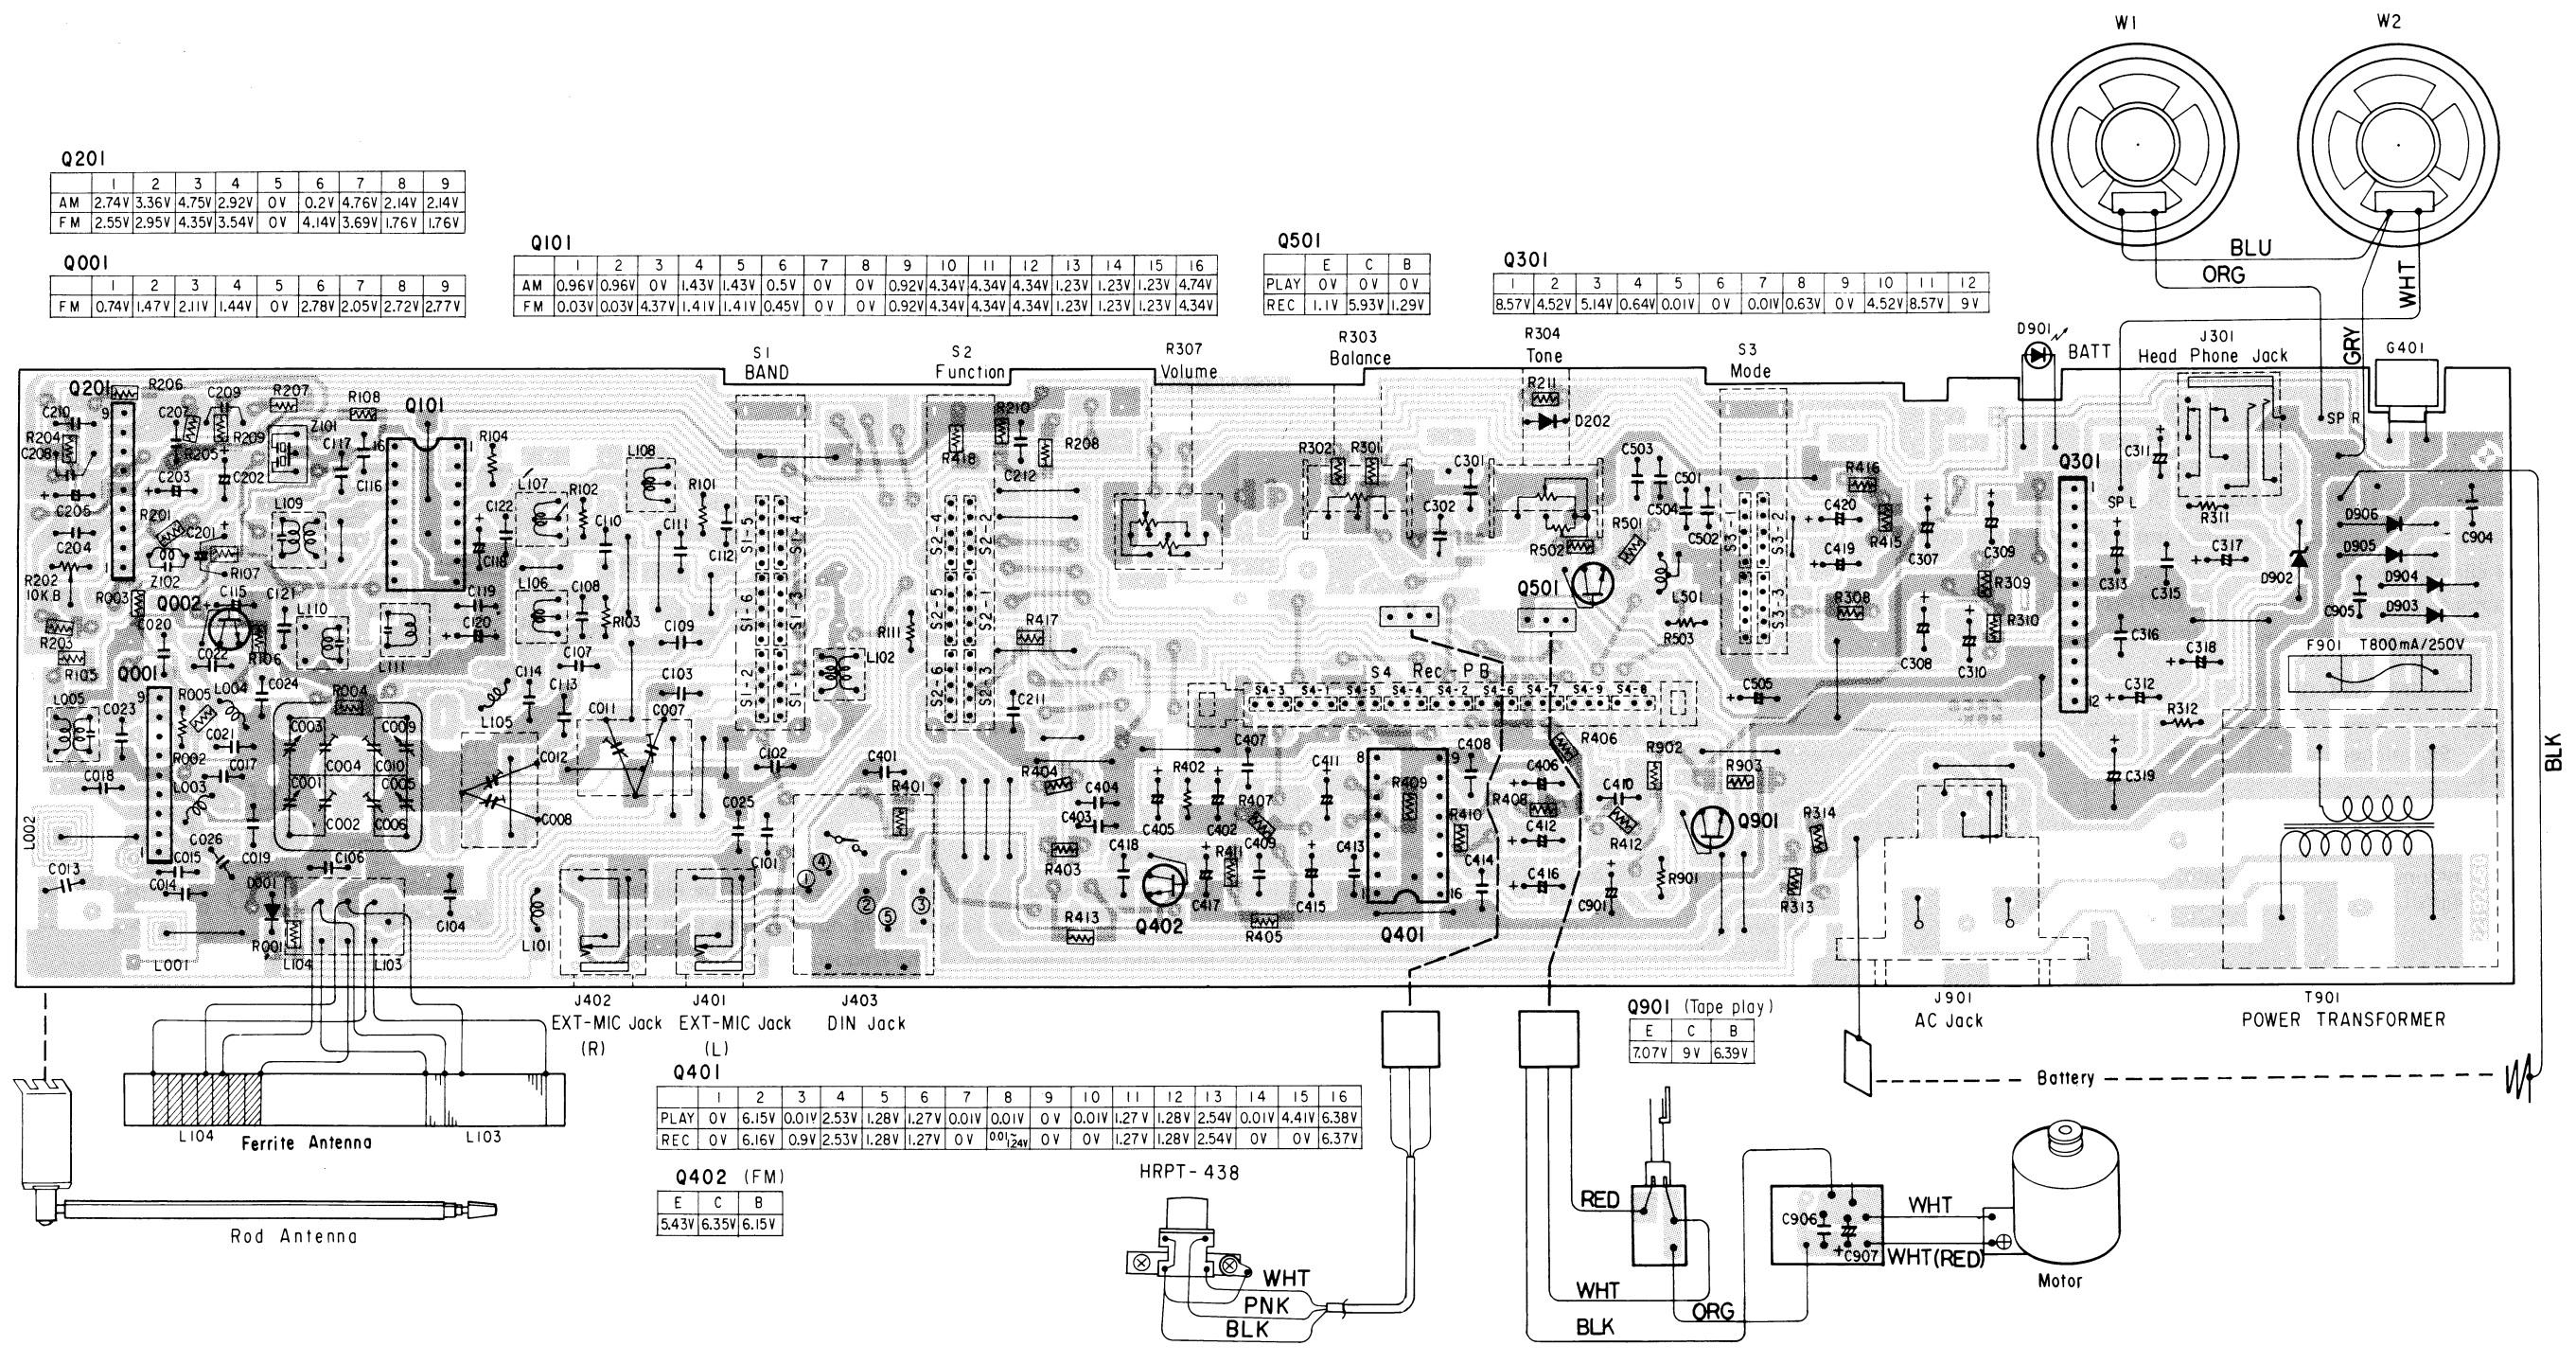 Master Electronics Repair !: TOSHIBA RT 6015 STEREO RADIO